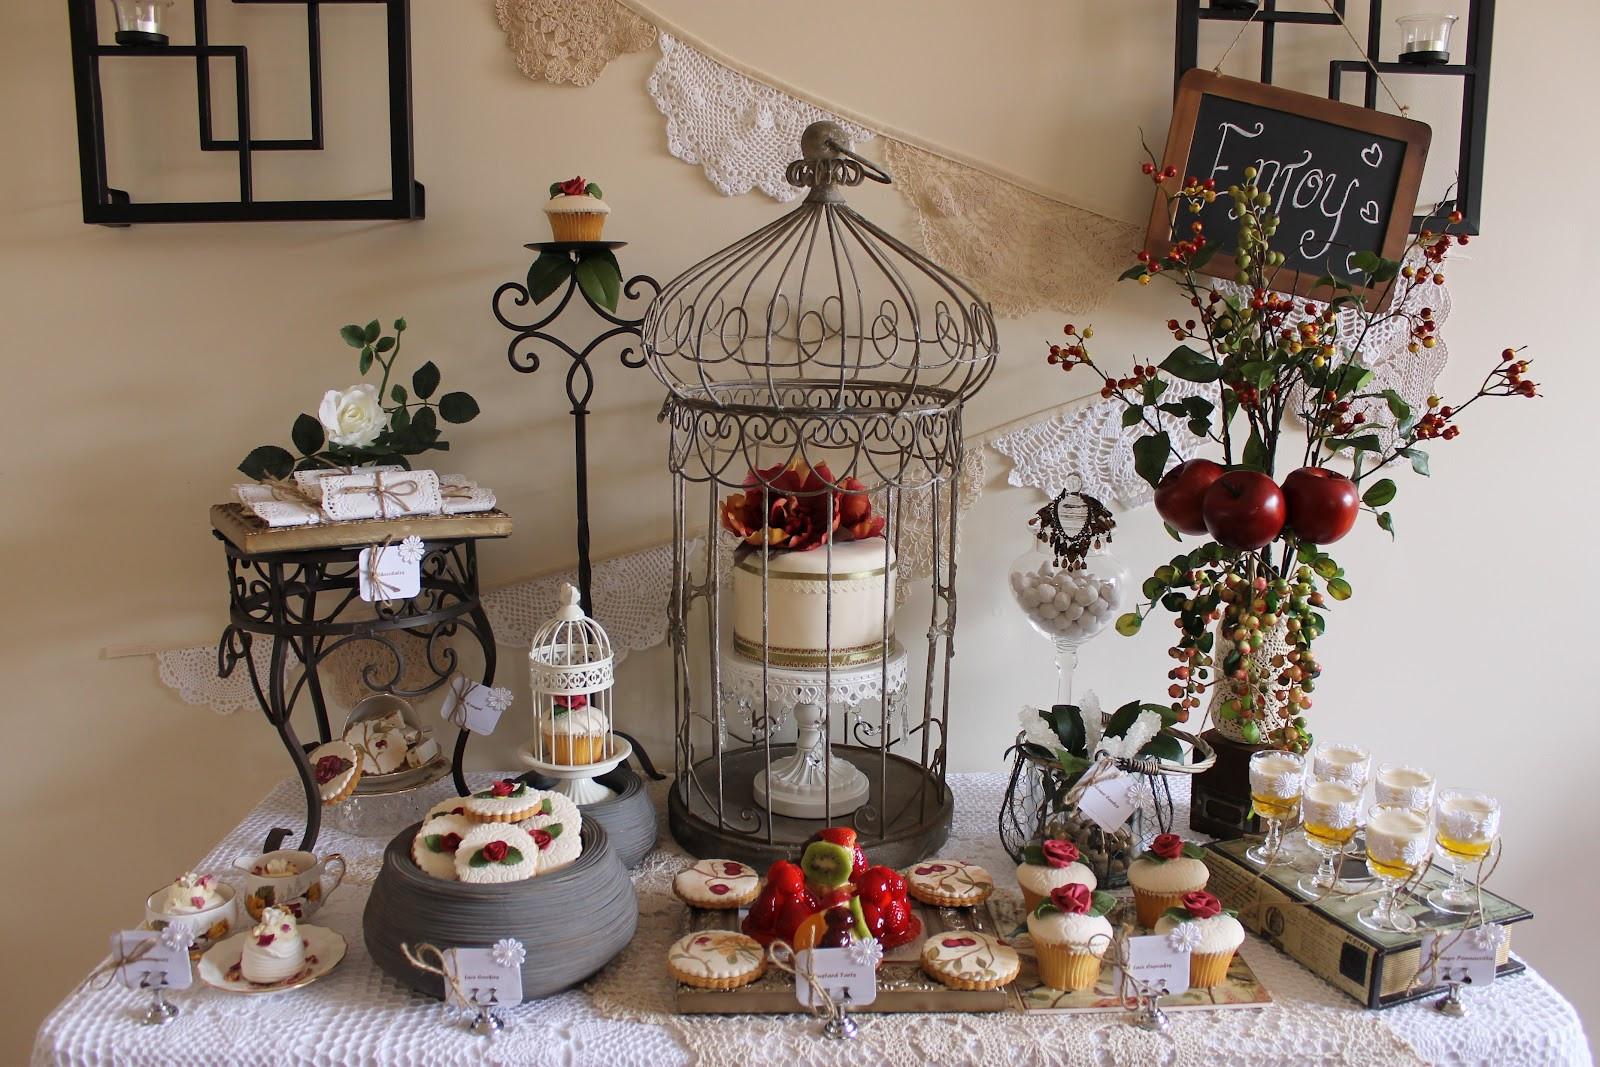 Birthday Decorations For Adults  Elegant Birthday Decorations For Adults Minimalist